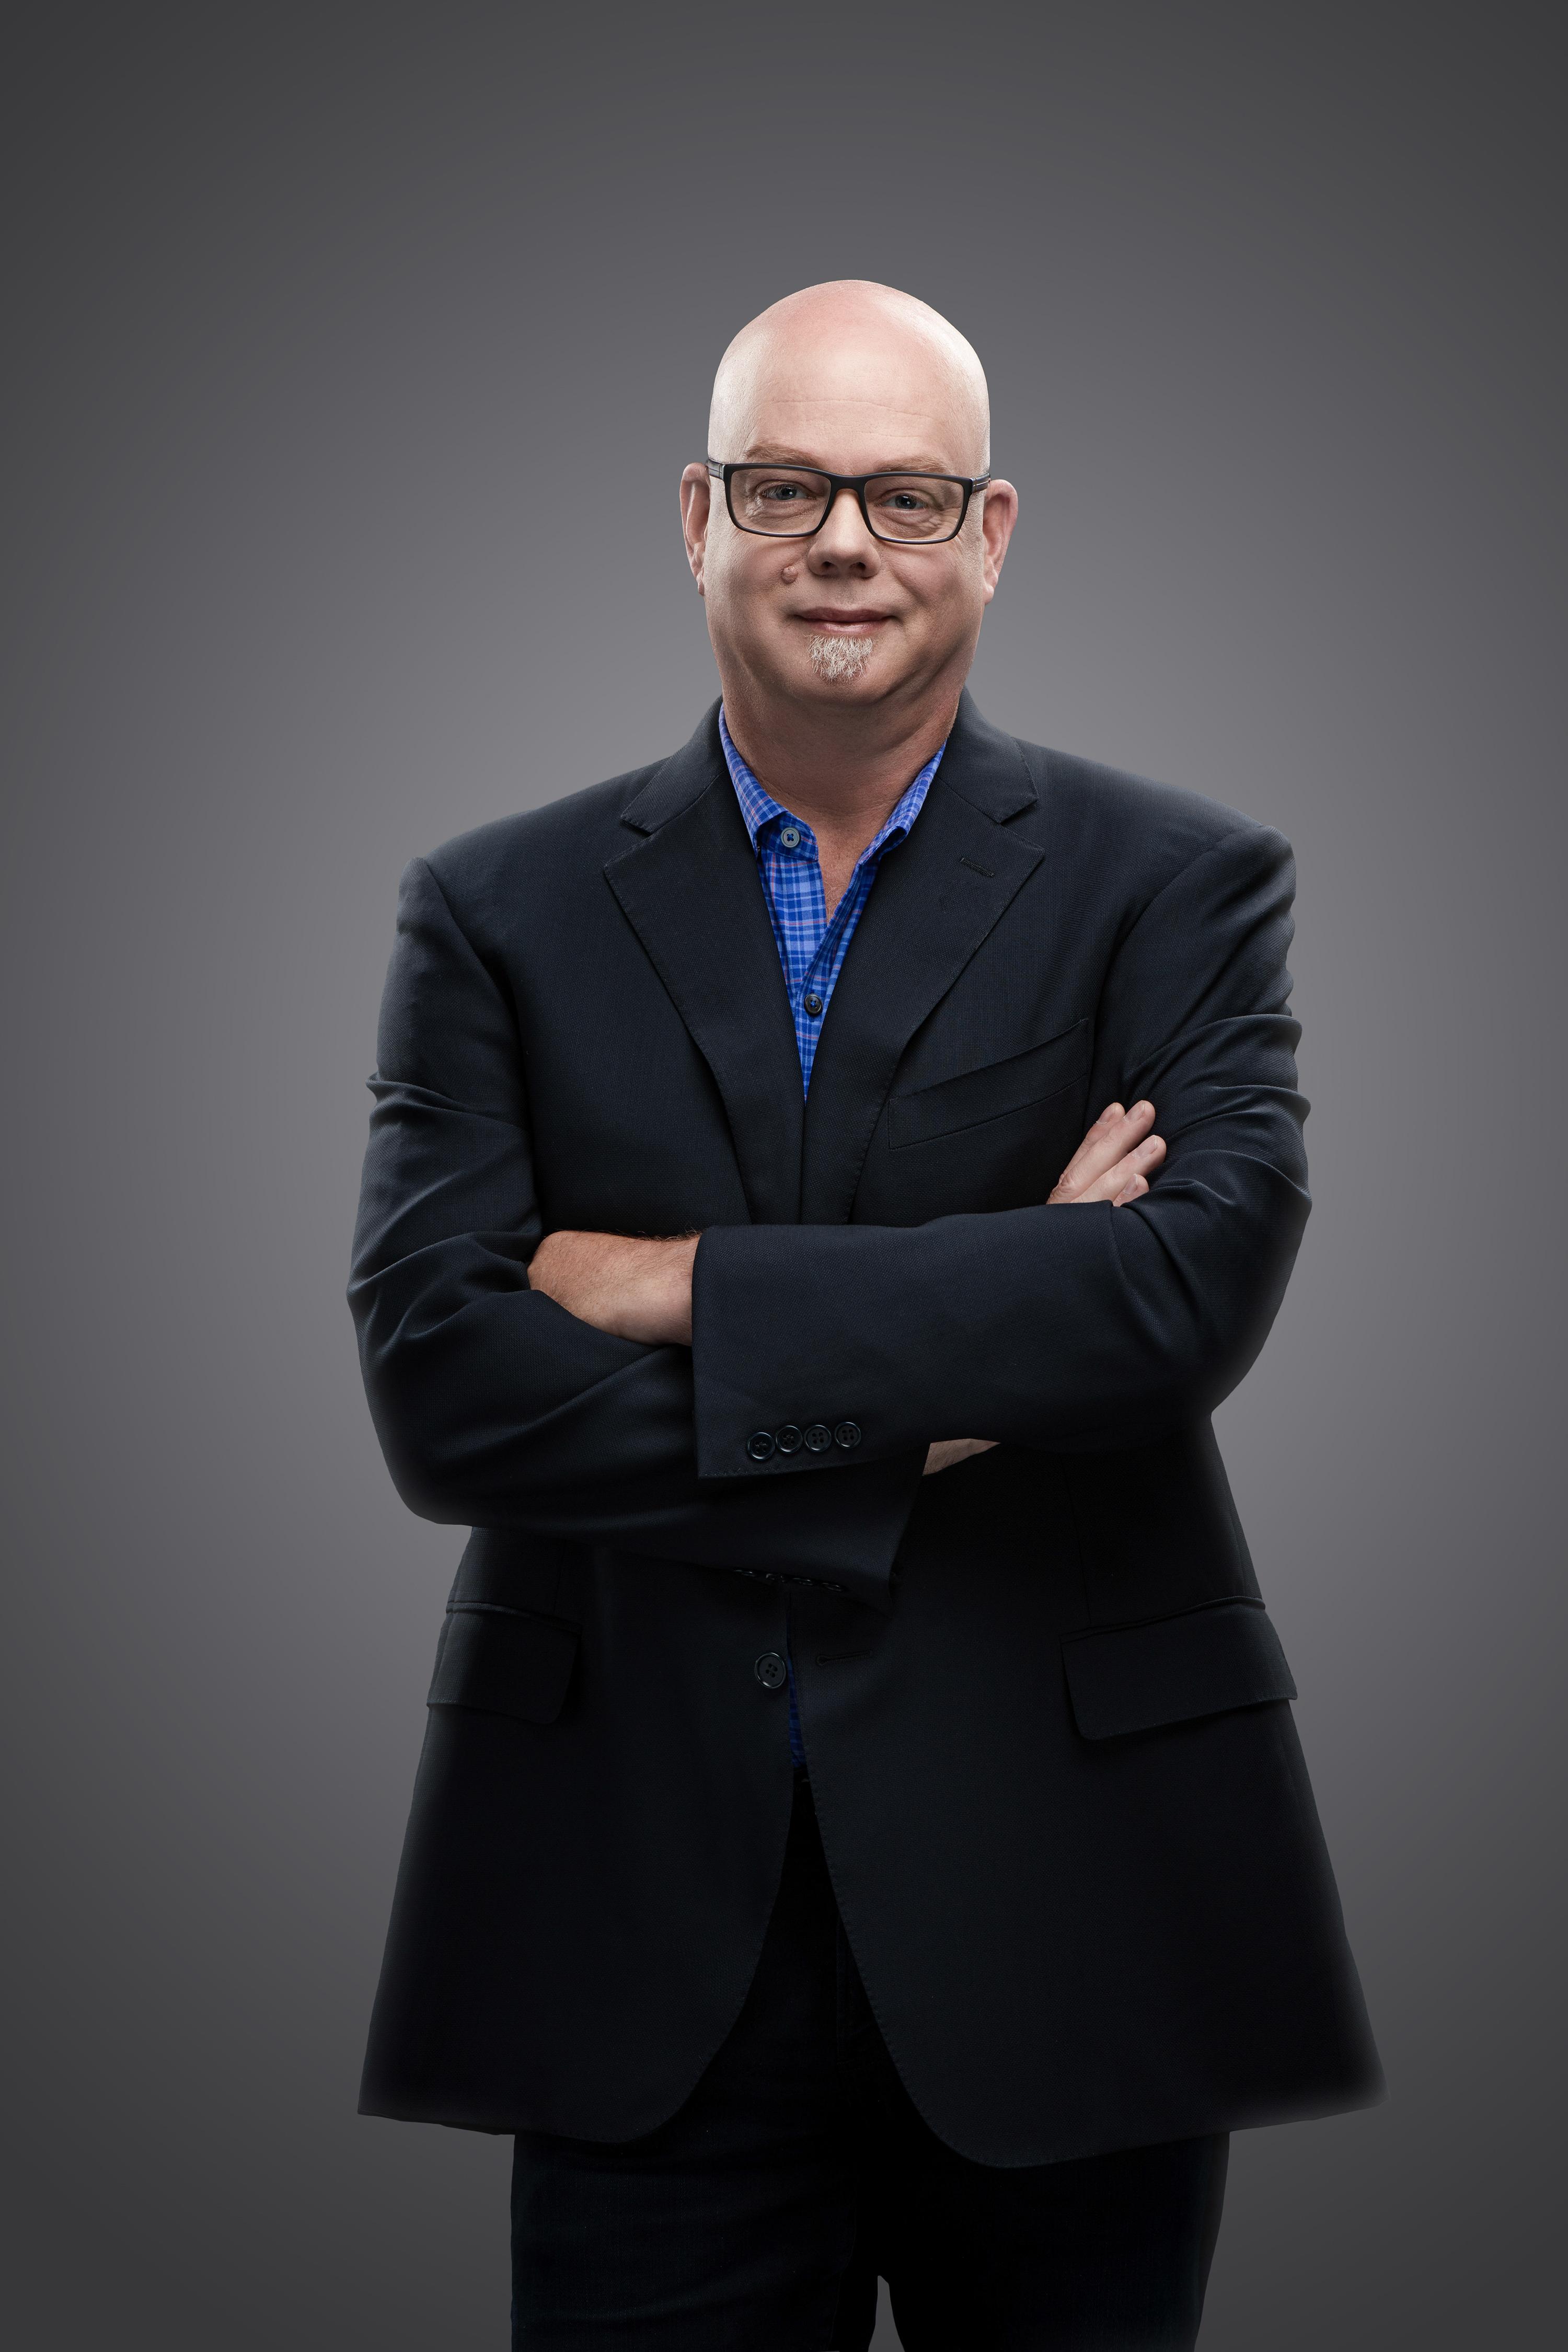 Mark duchesne